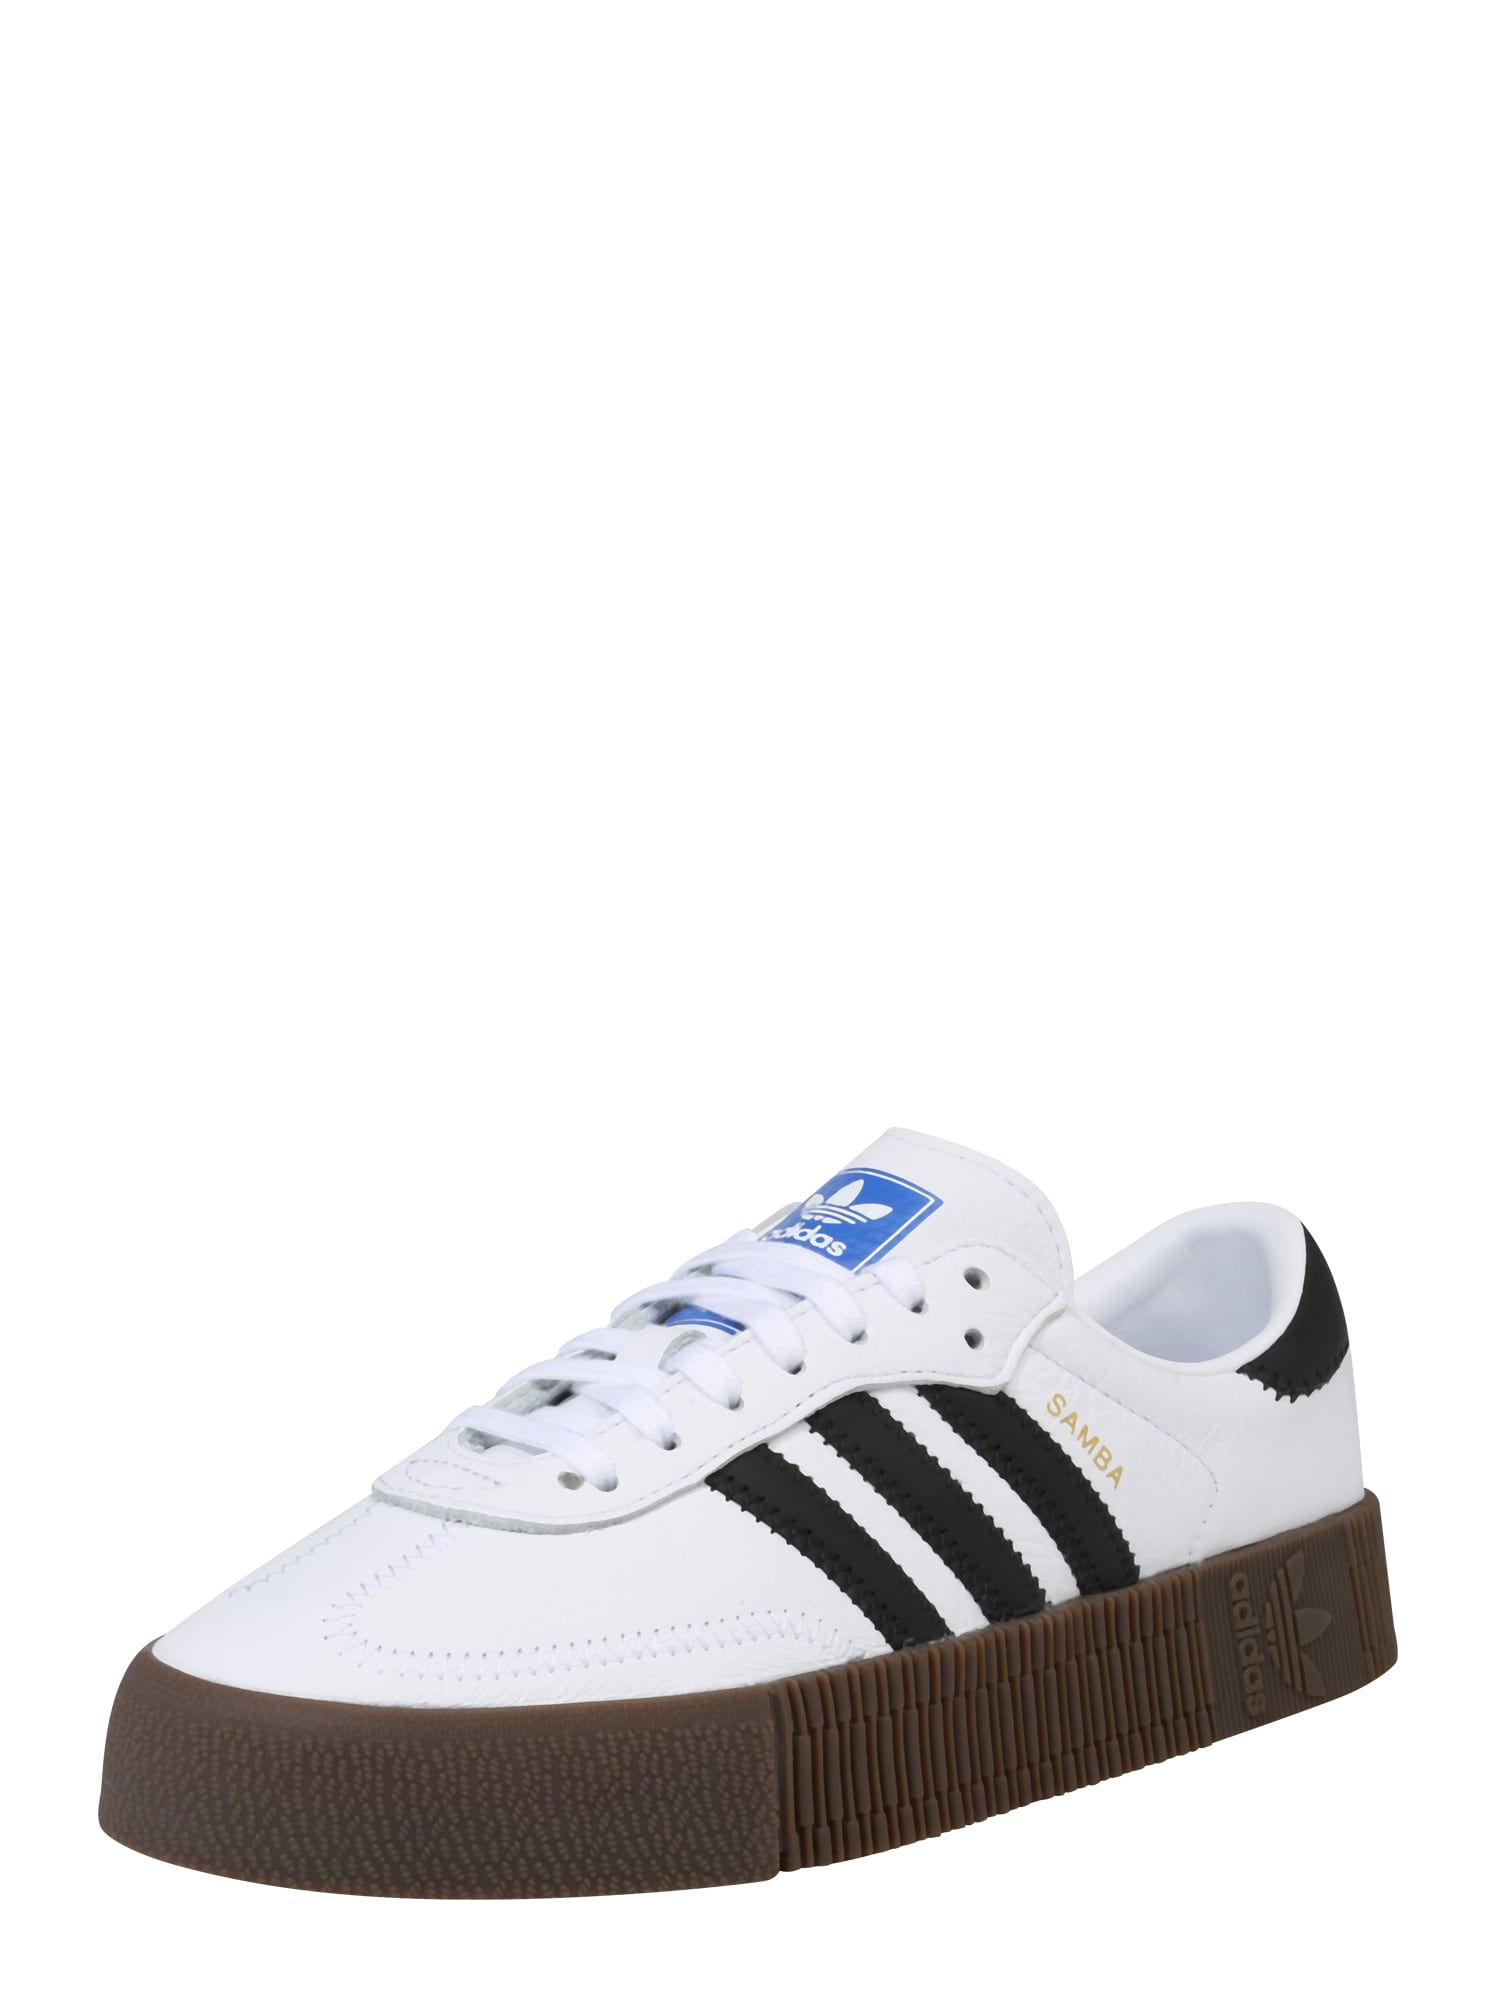 ADIDAS ORIGINALS, Dames Sneakers laag 'SAMBAROSE', zwart / wit